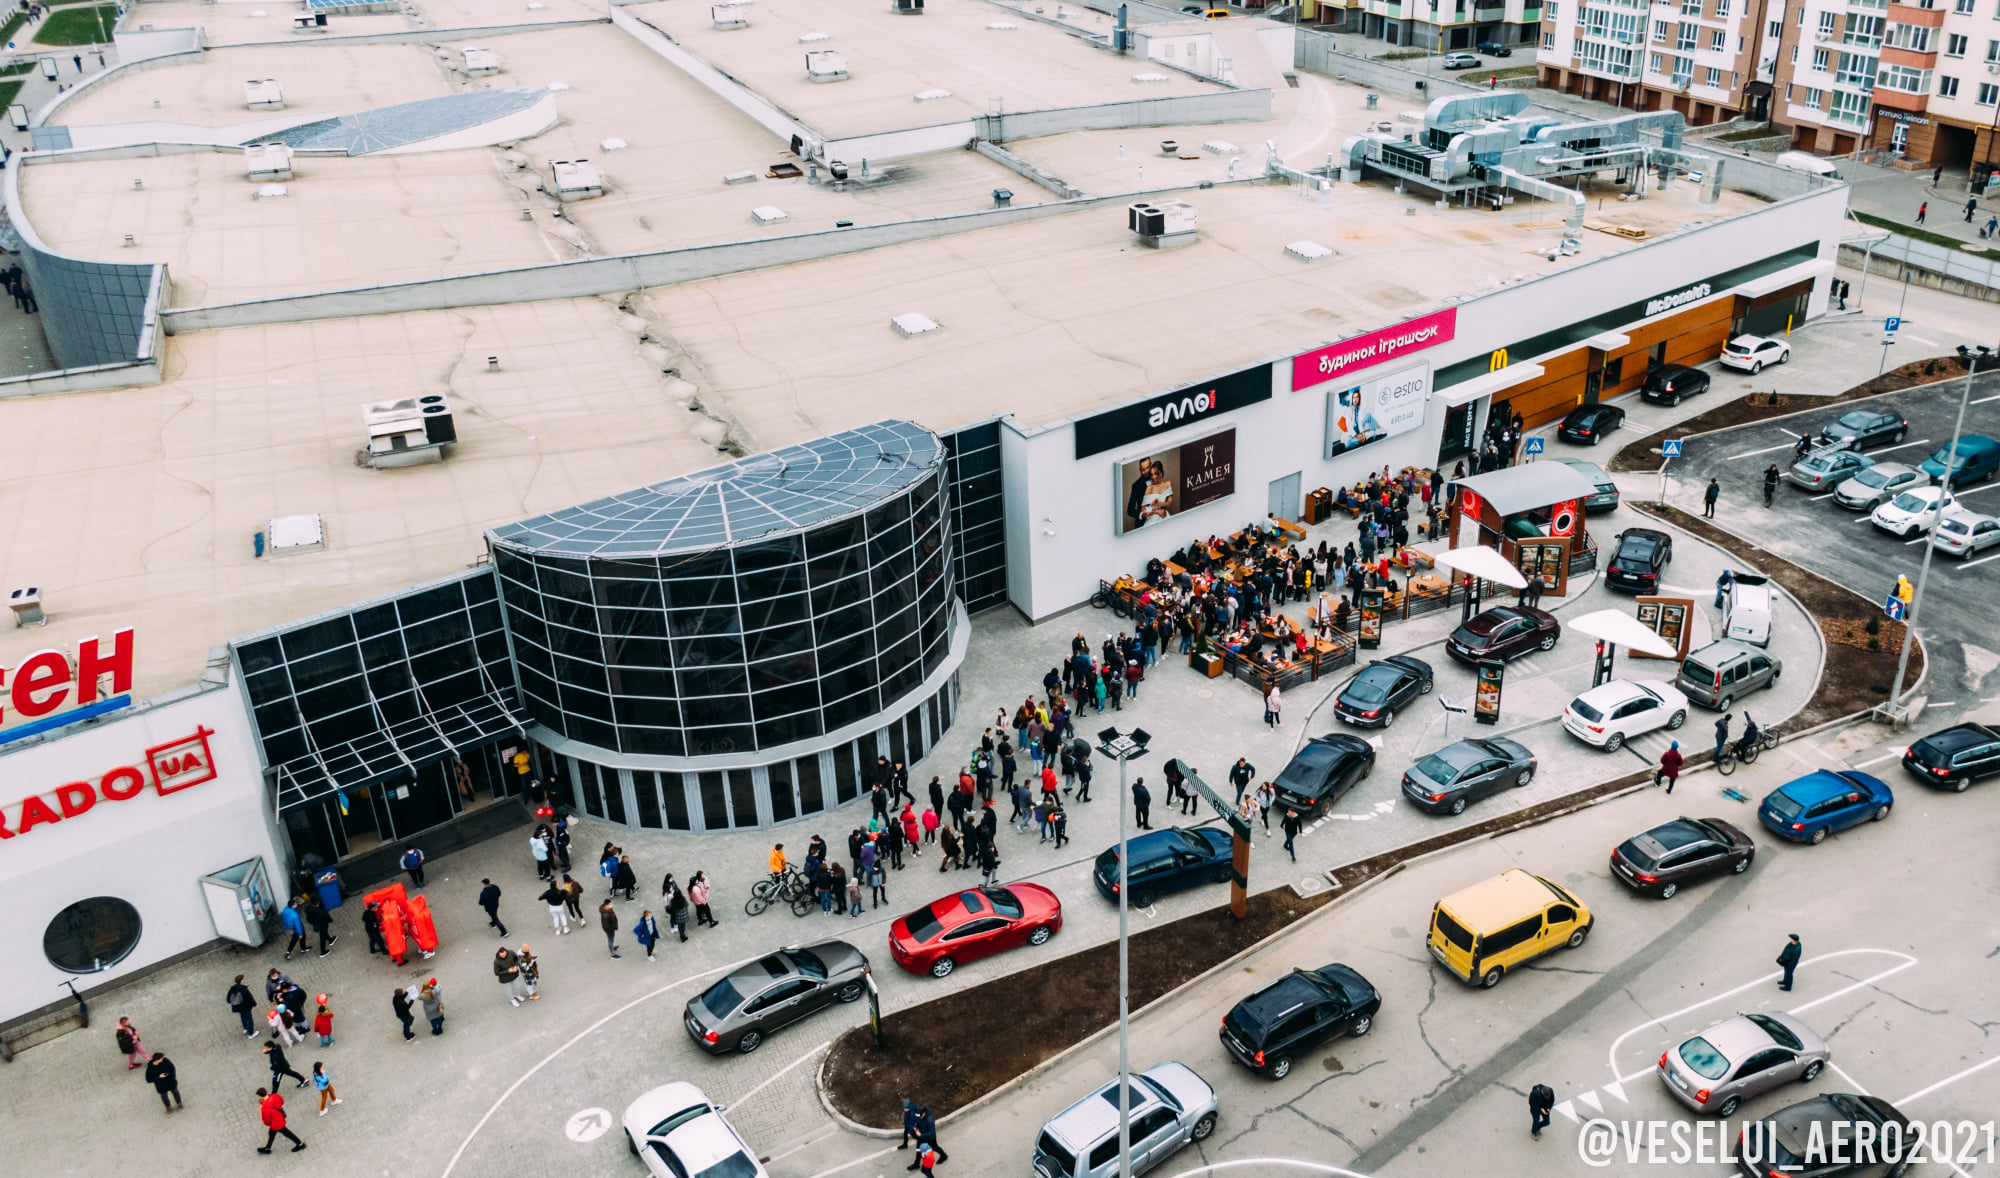 Во Франковске появился McDonald's: люди ринулись за бургерами, забыв о карантине (видео)